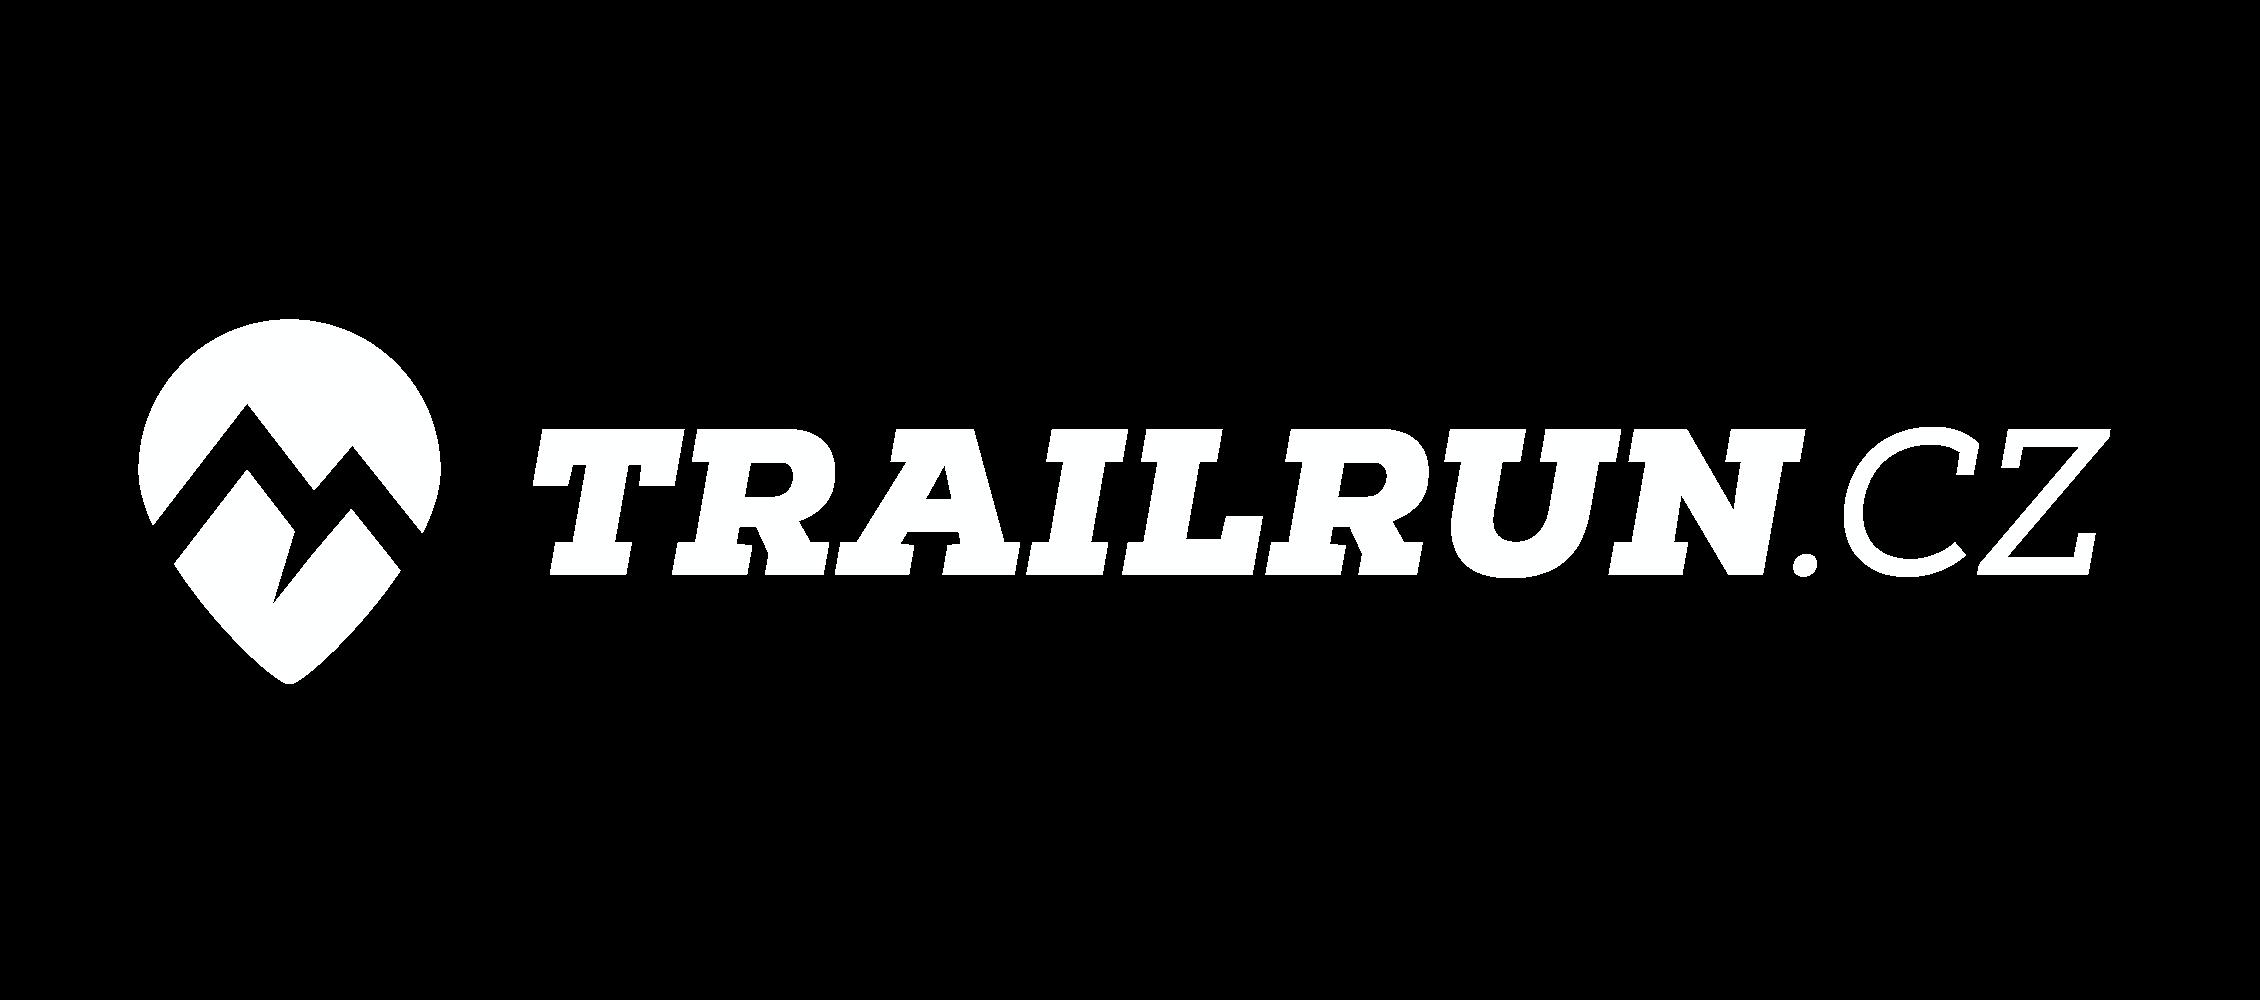 trailrun.cz